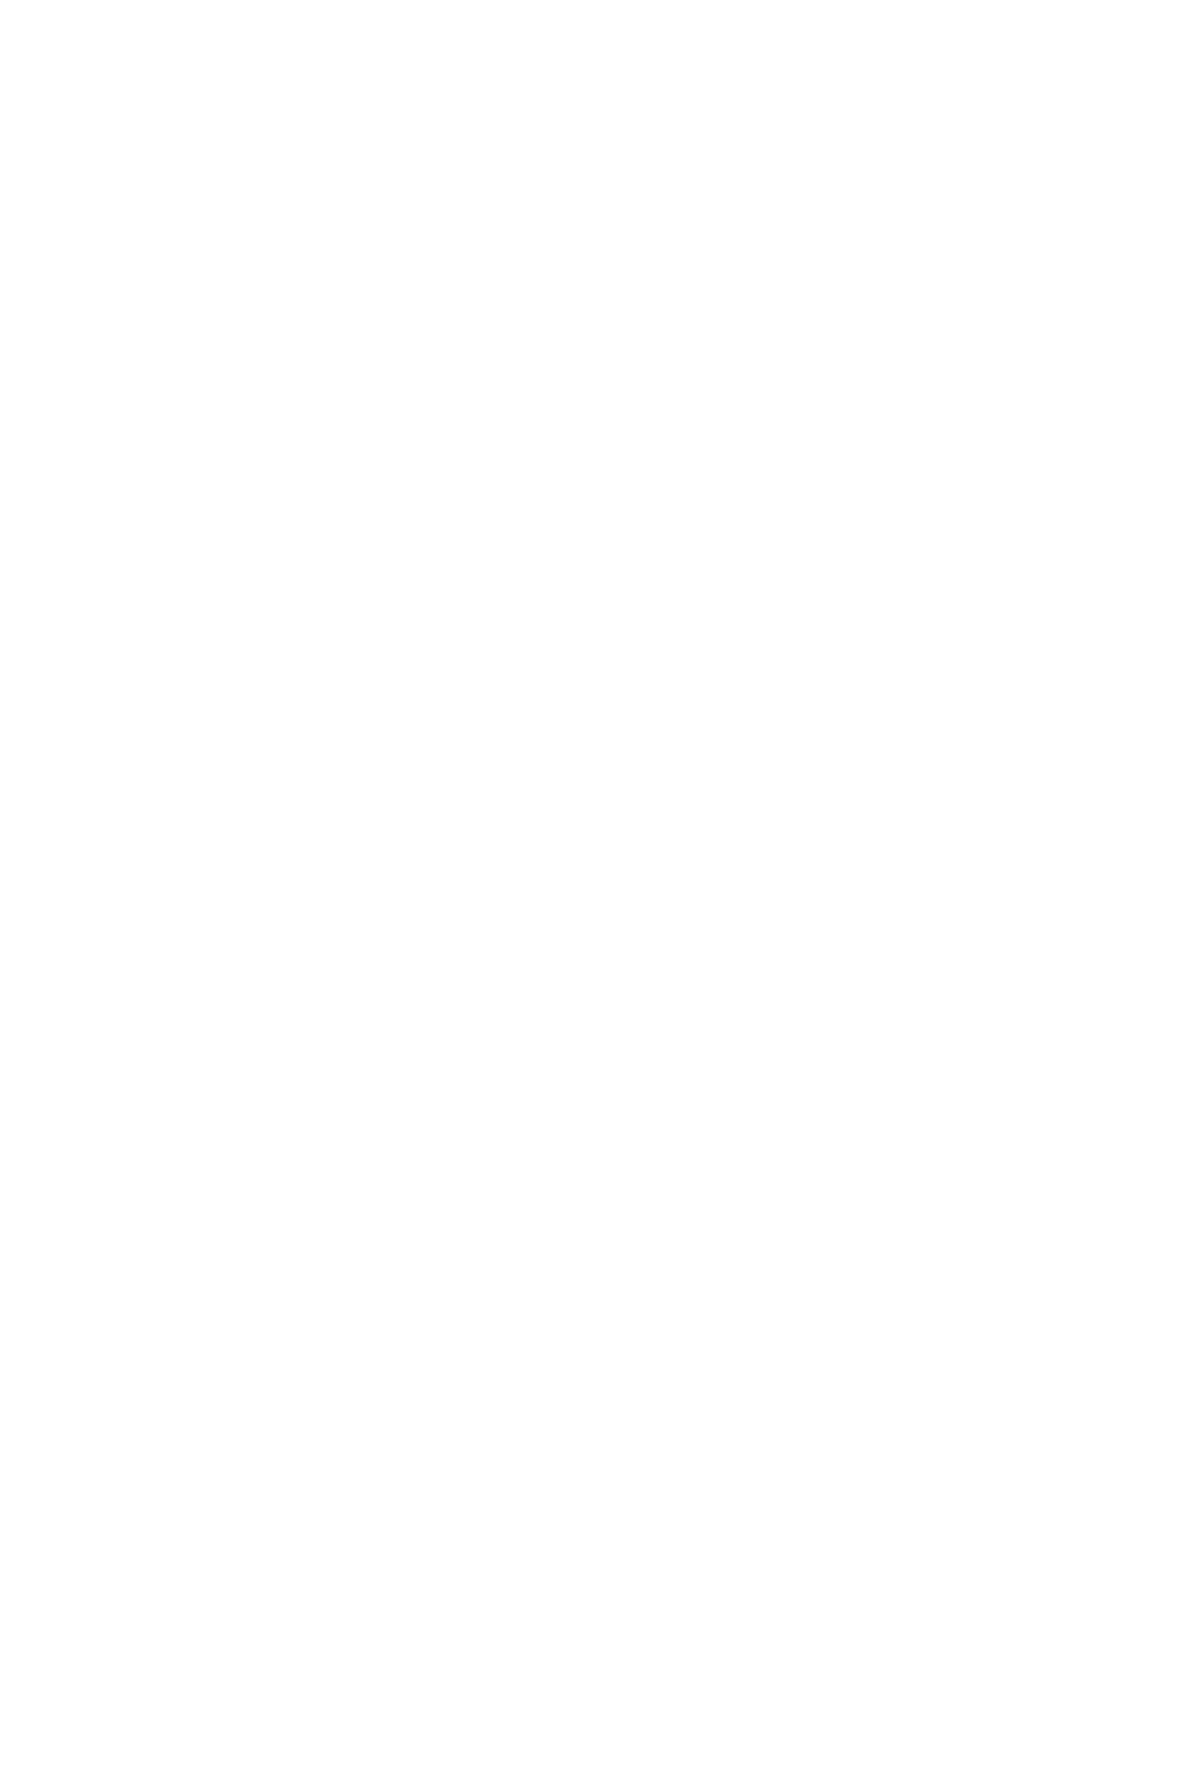 [Astro Creep (Matsuryu)] Sword Art Unlimited (Sword Art Online) [ENG]v2 1